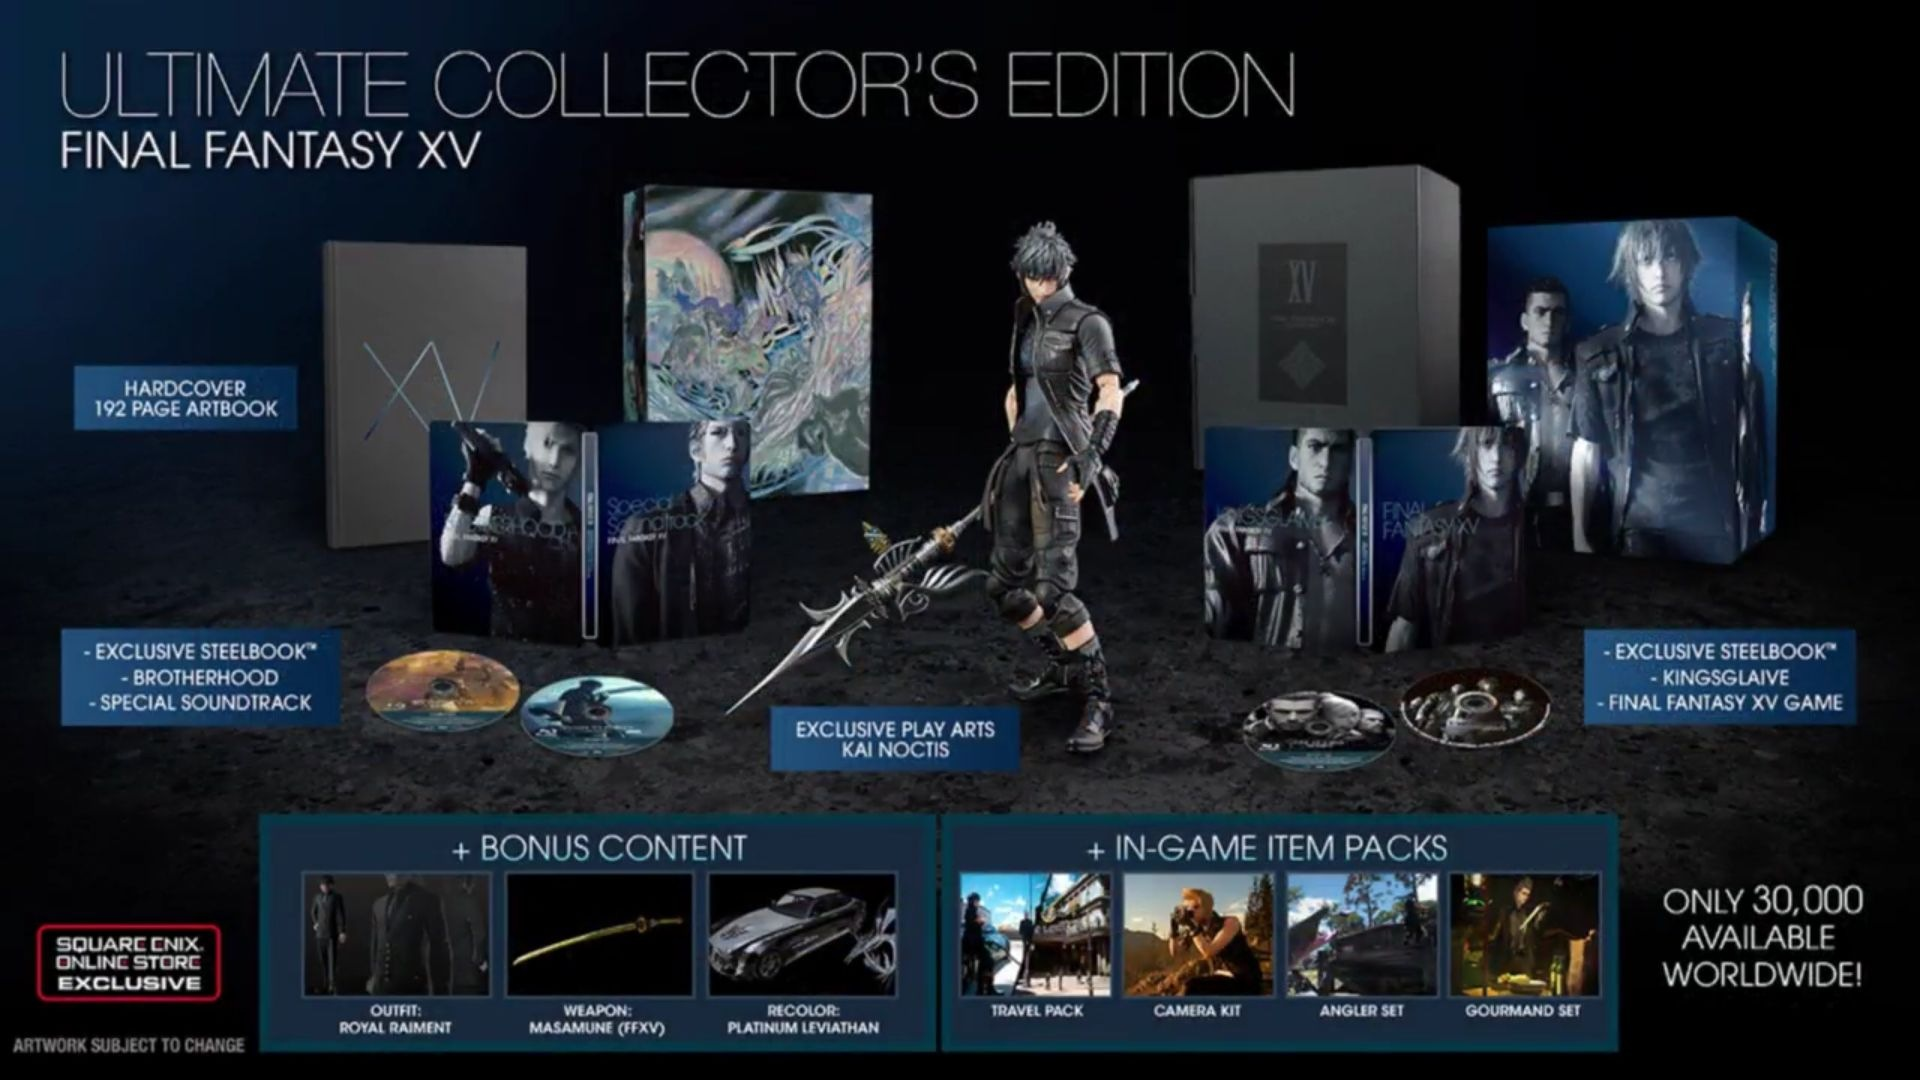 Final Fantasy XV - Ultimate collector's edition